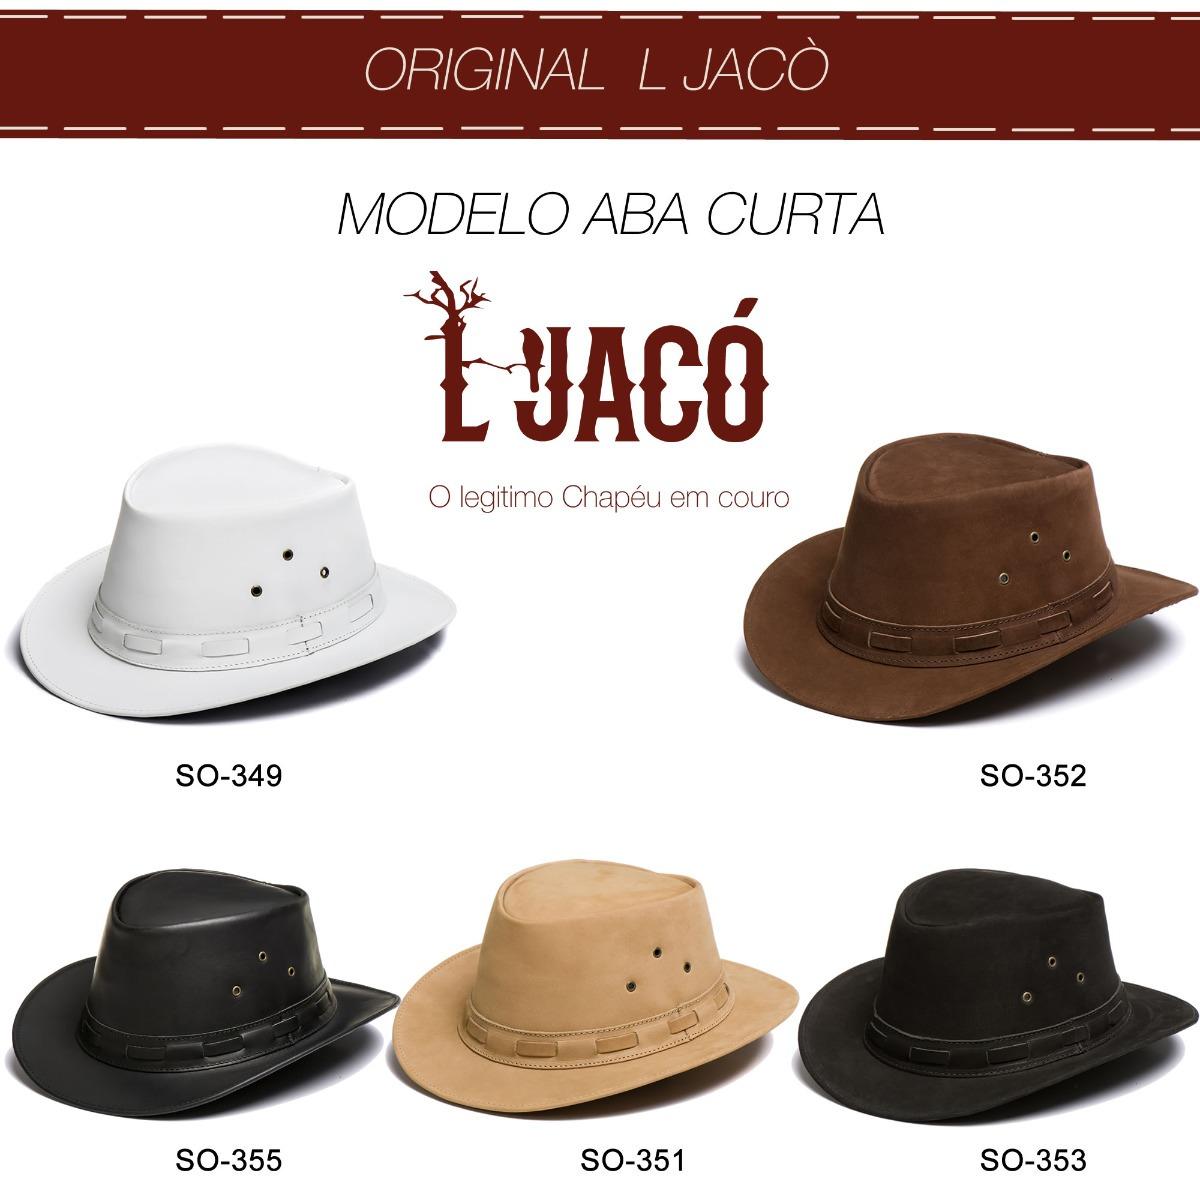 b3fe69770ac69 Chapeu Em Couro Modelo Aba Curta Preto L Jaco So-353 - R  158